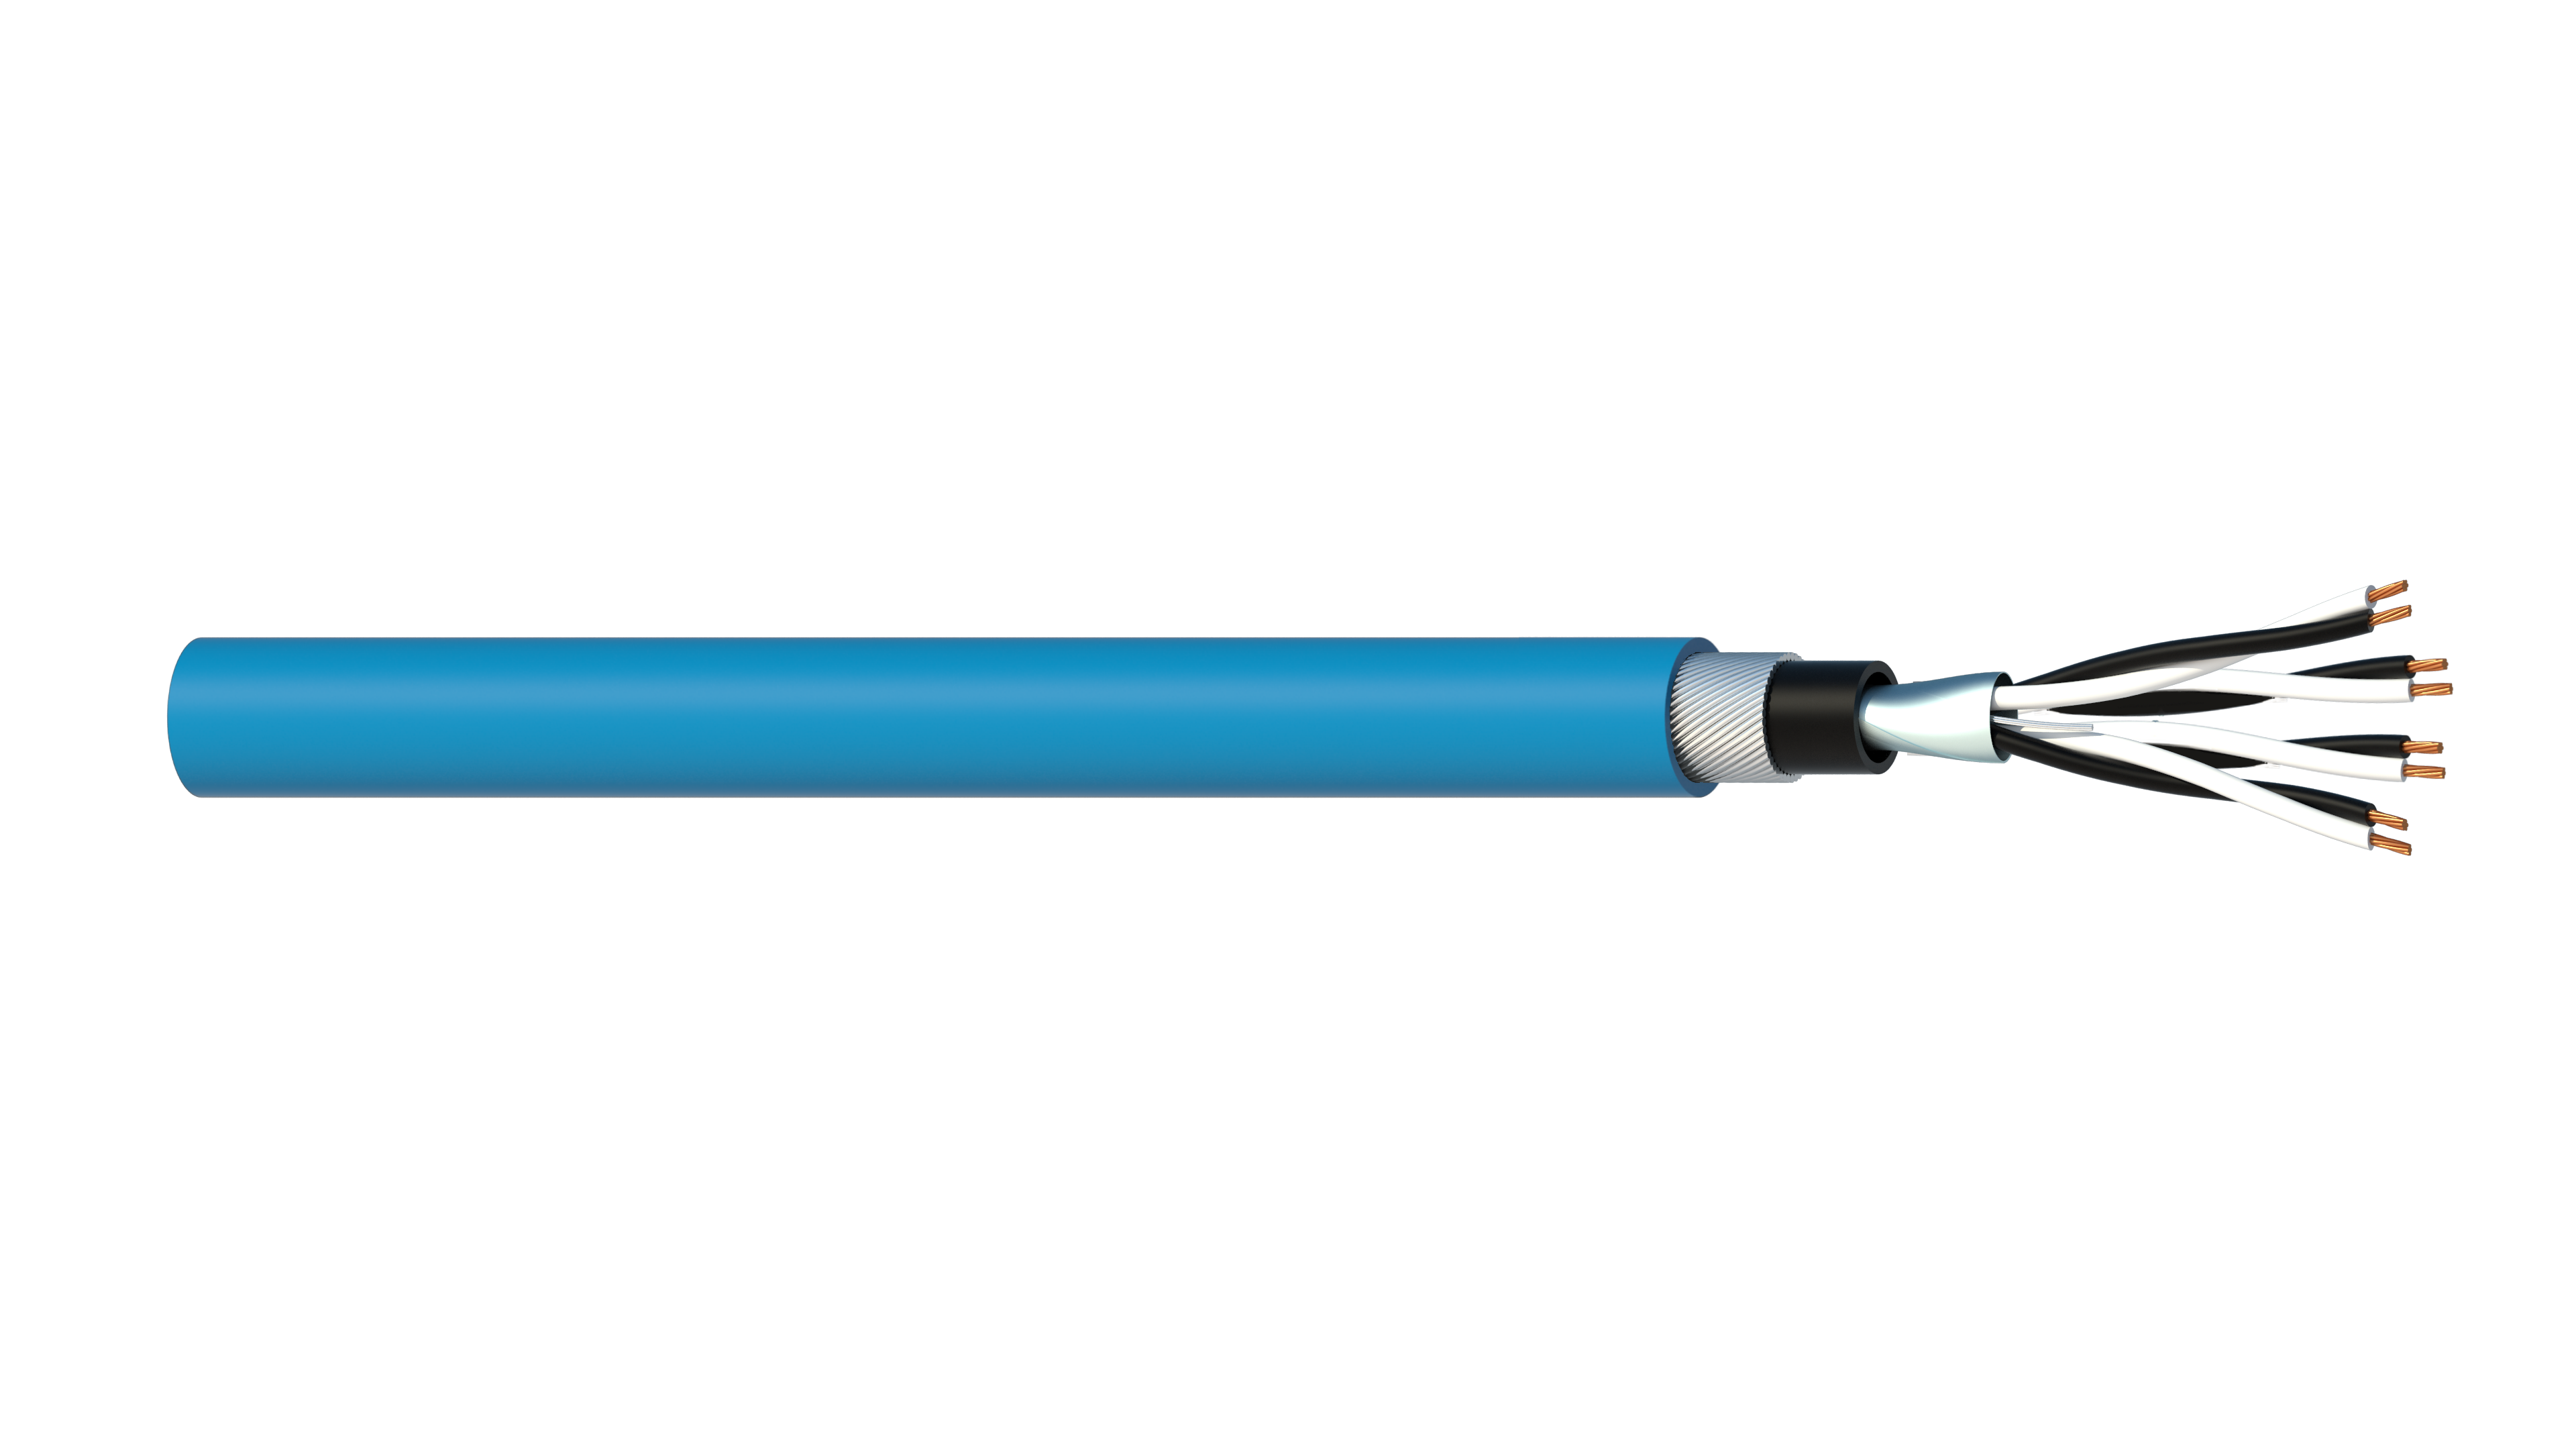 2 Pair 0.5mm2 Cu/PVC/OS/PVC/SWA/PVC Maser Instrumentation Cable - Blue Sheath